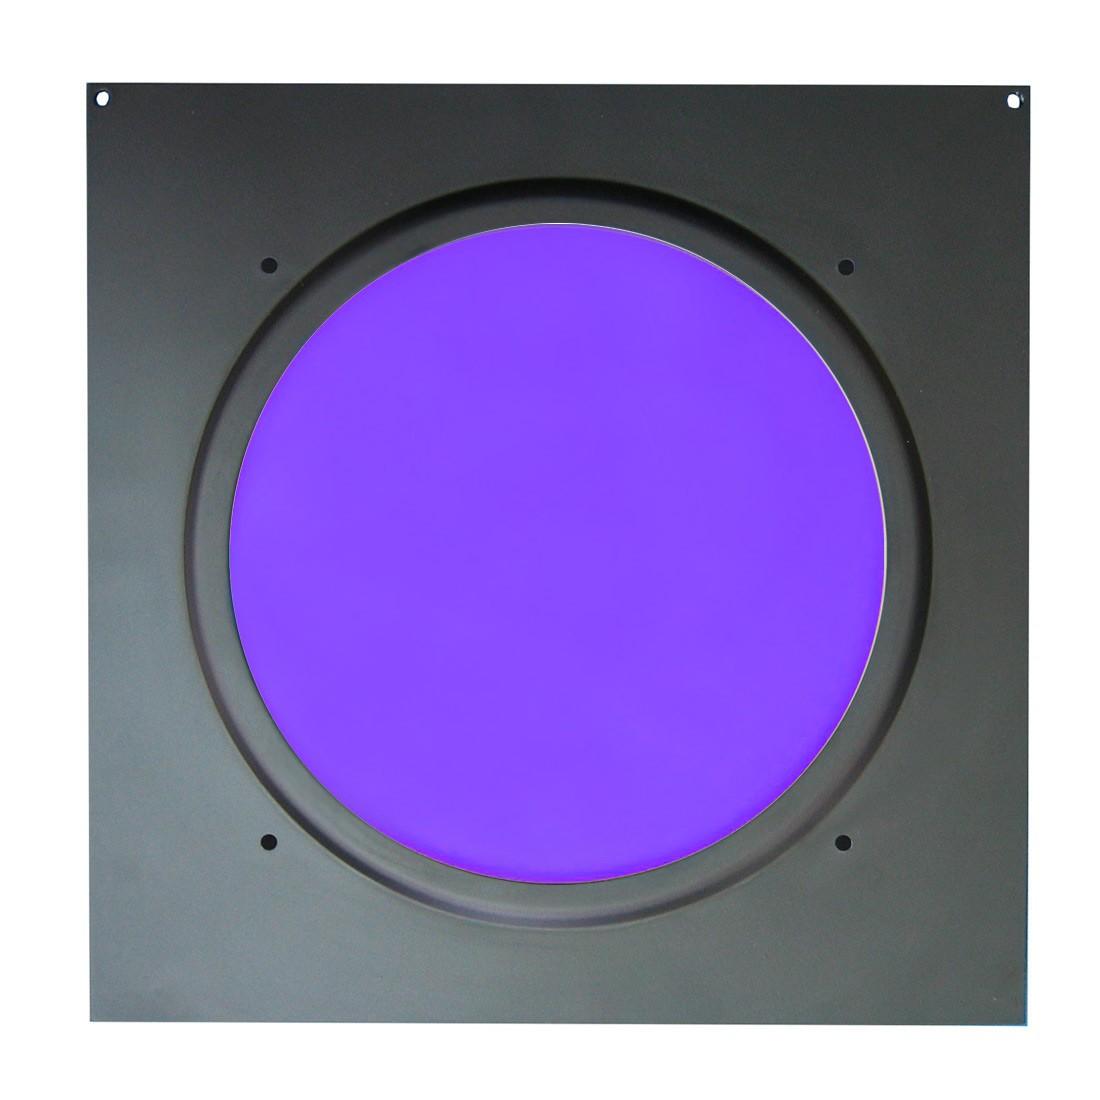 American DJ Dichrofilter PAR 56 (czarny) fioletowy - filtr do reflektorów PAR 56